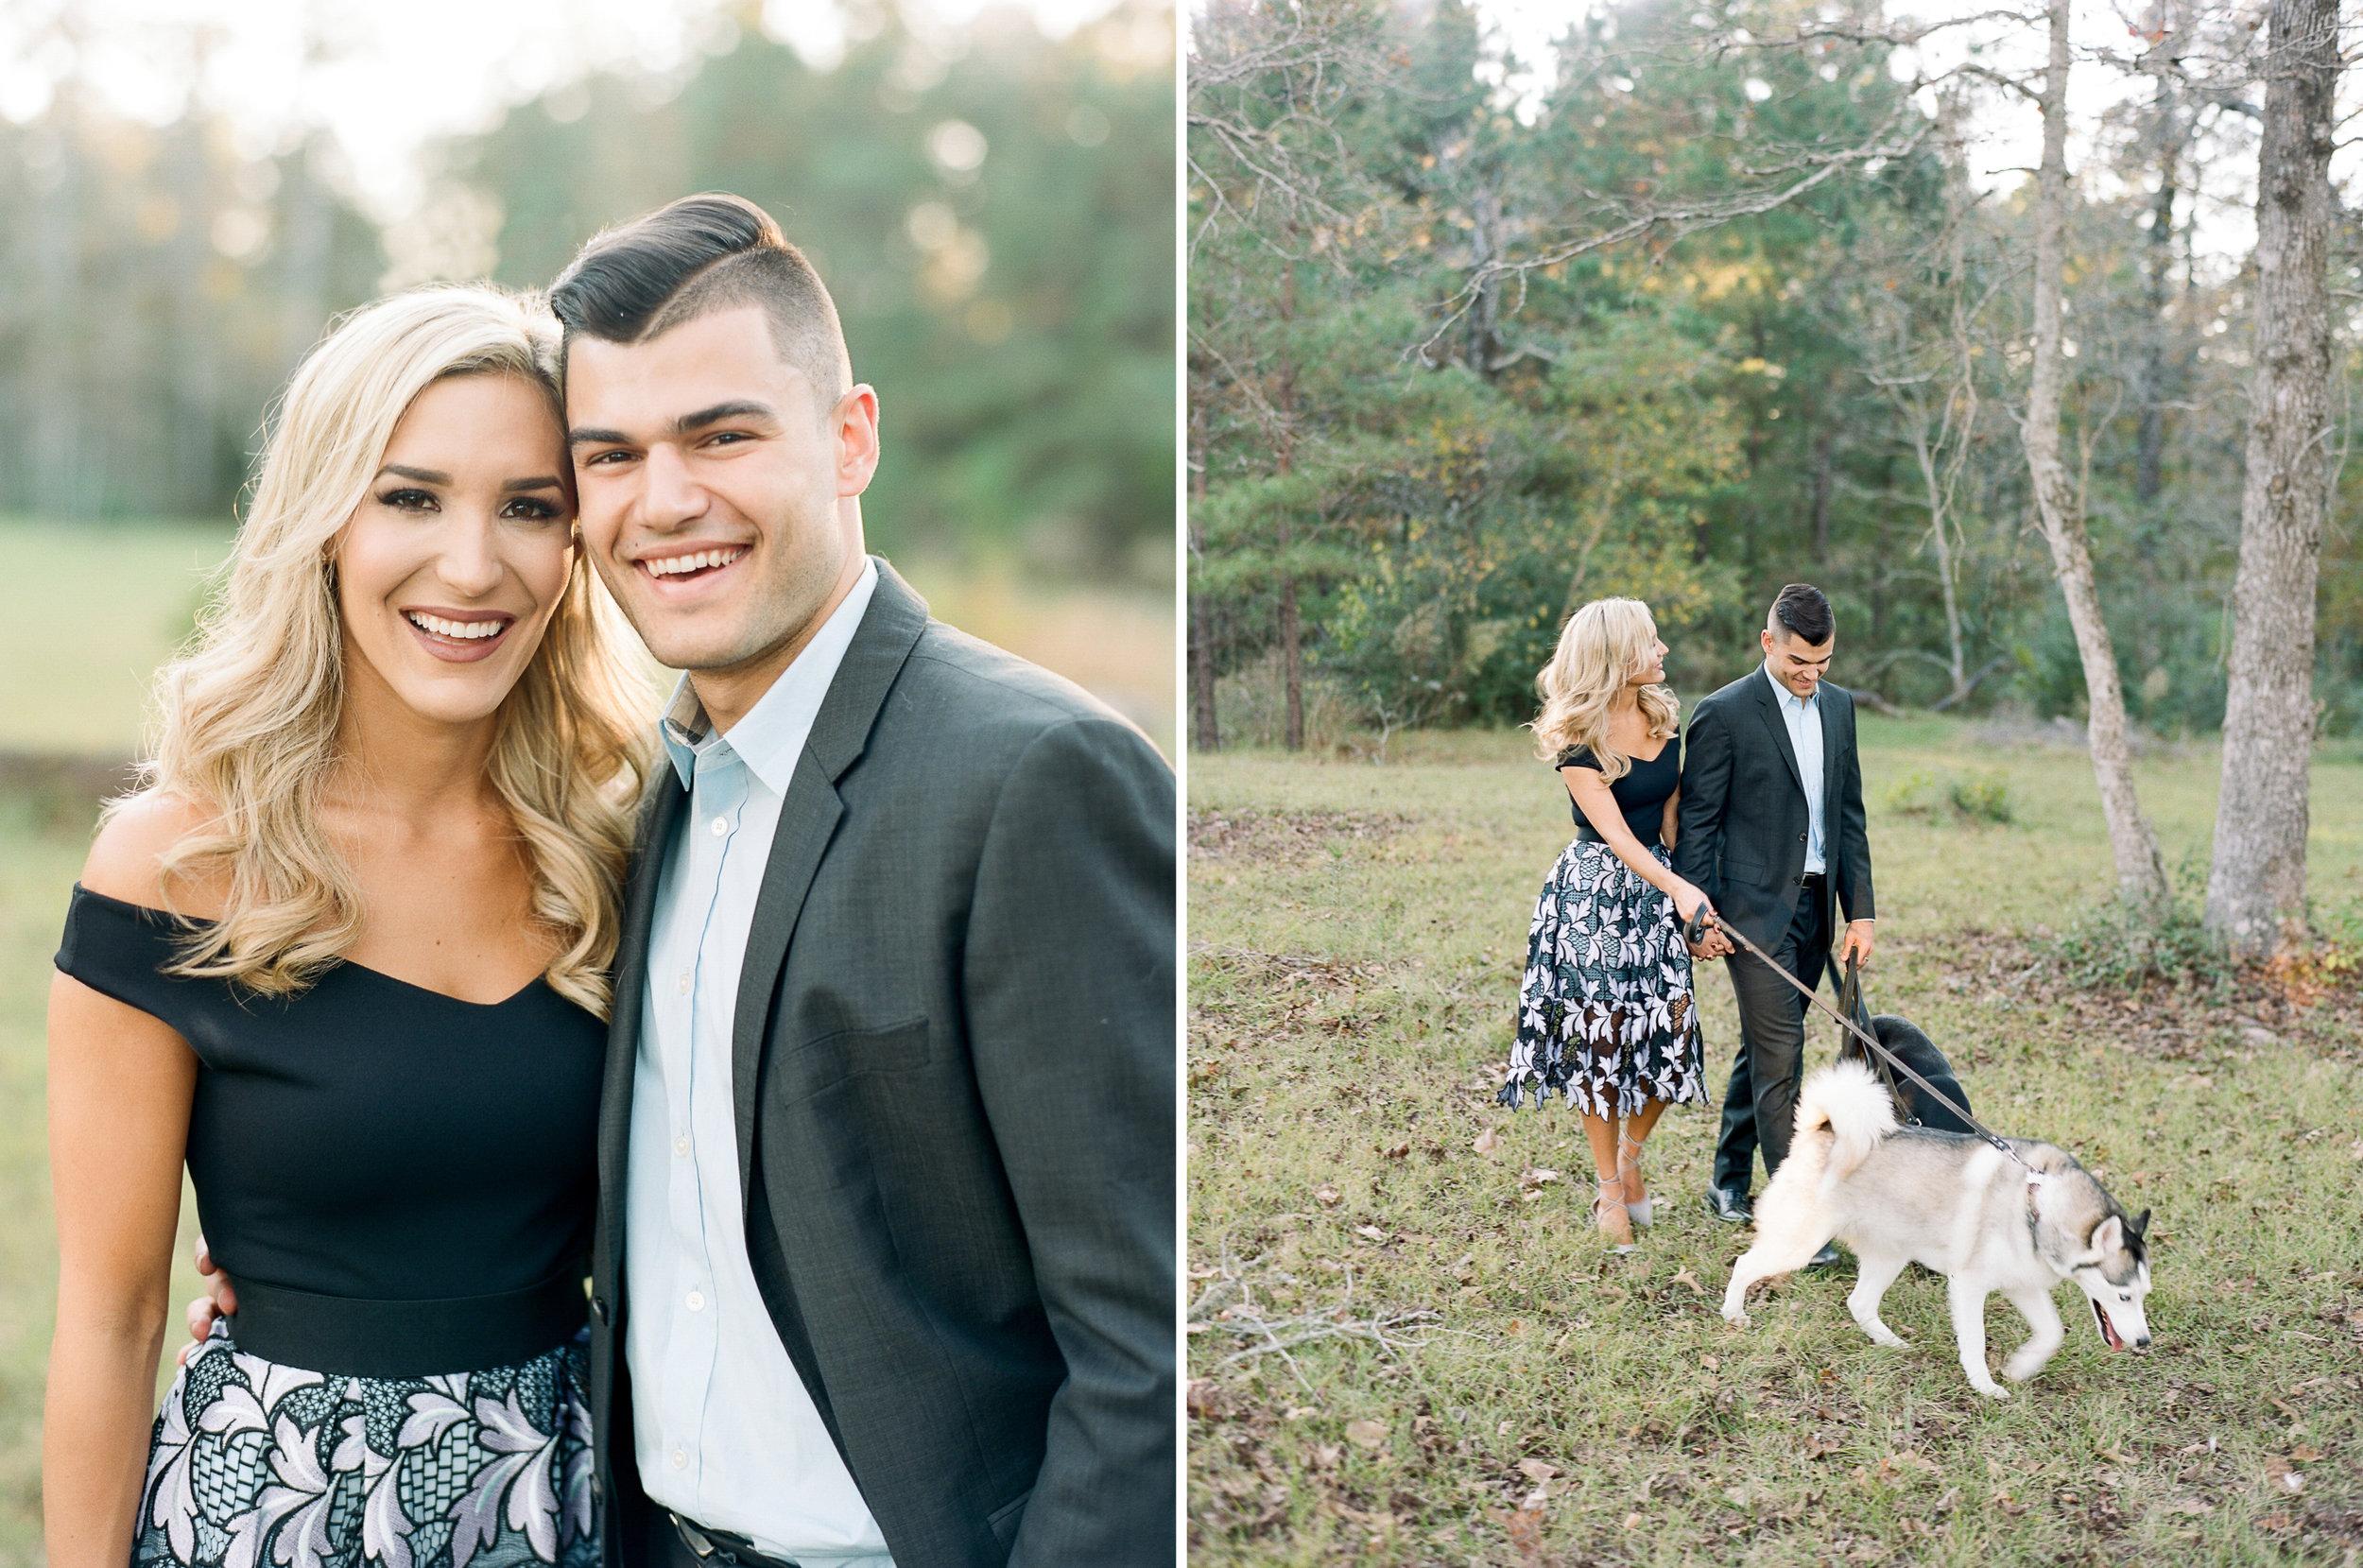 dana-fernandez-photography-houston-portrait-photographer-wedding-engagements-lance-kara-mccullers-houston-astros-film-photographer-105.jpg